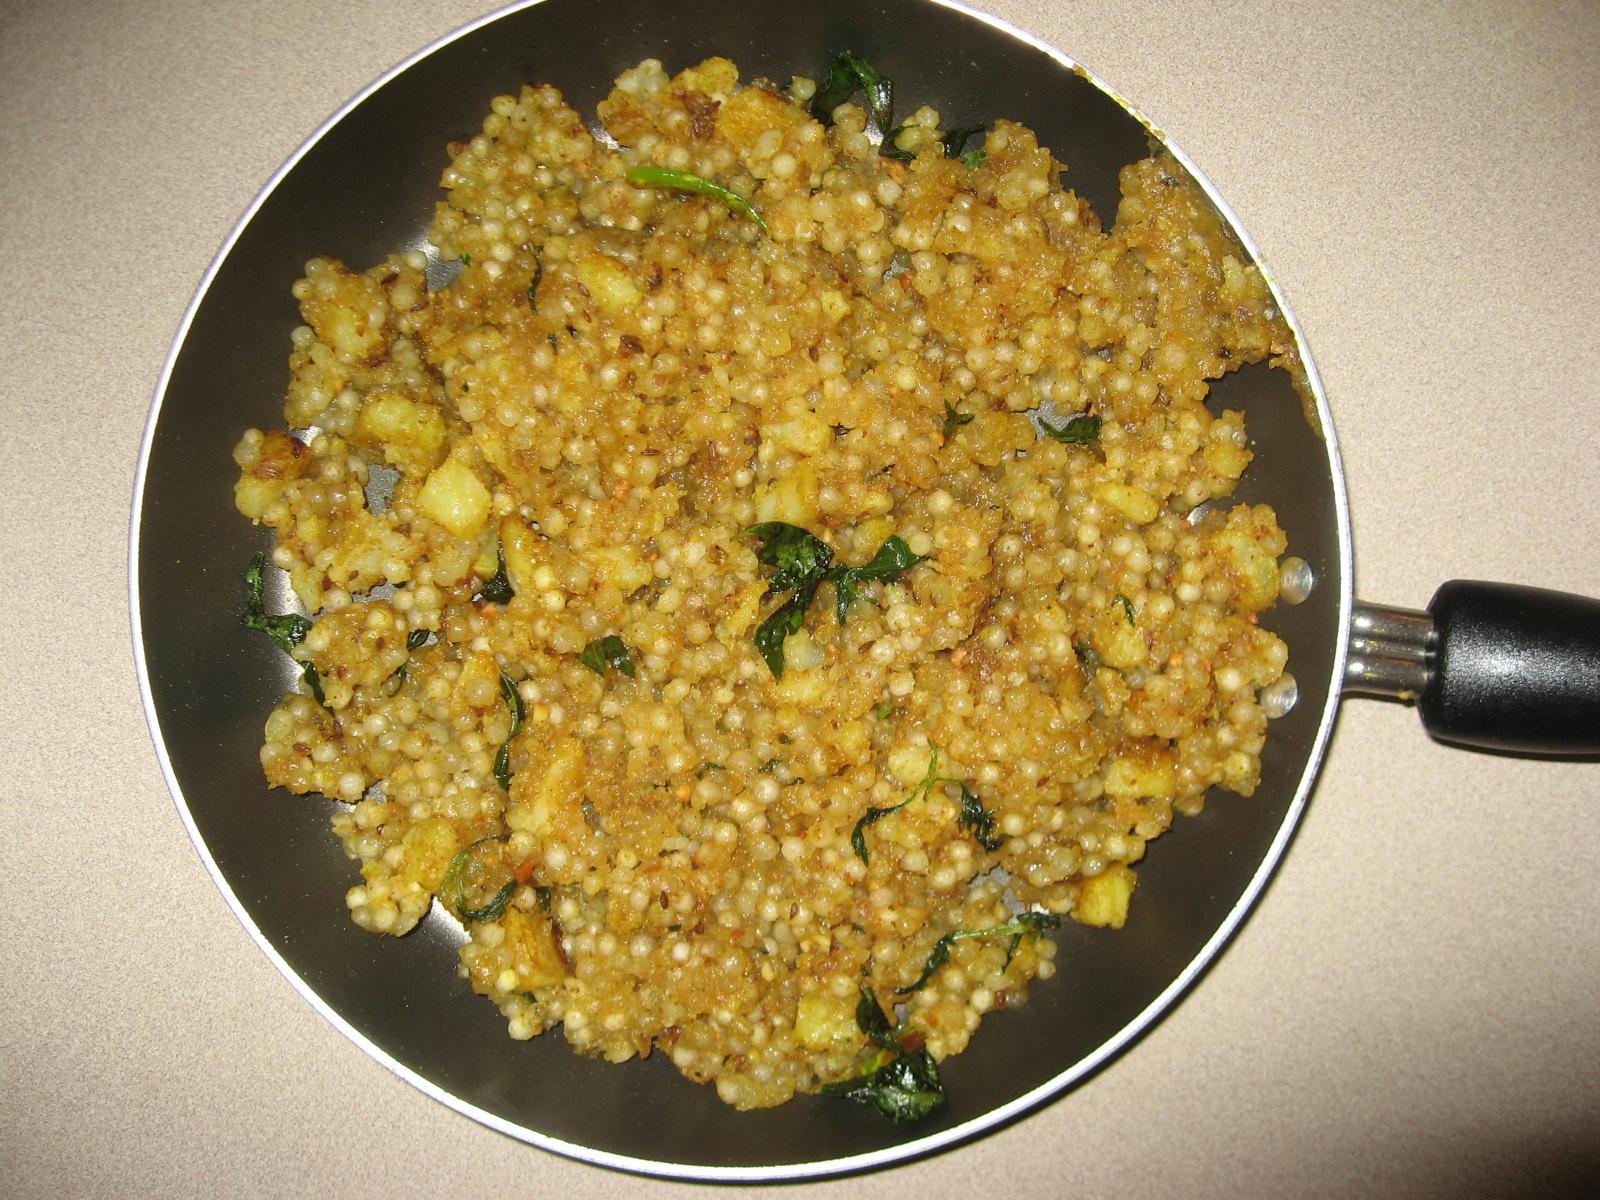 Sabudana Cake Recipe In Marathi: Sabudana Upma/Khichdi Recipe By Snigdha